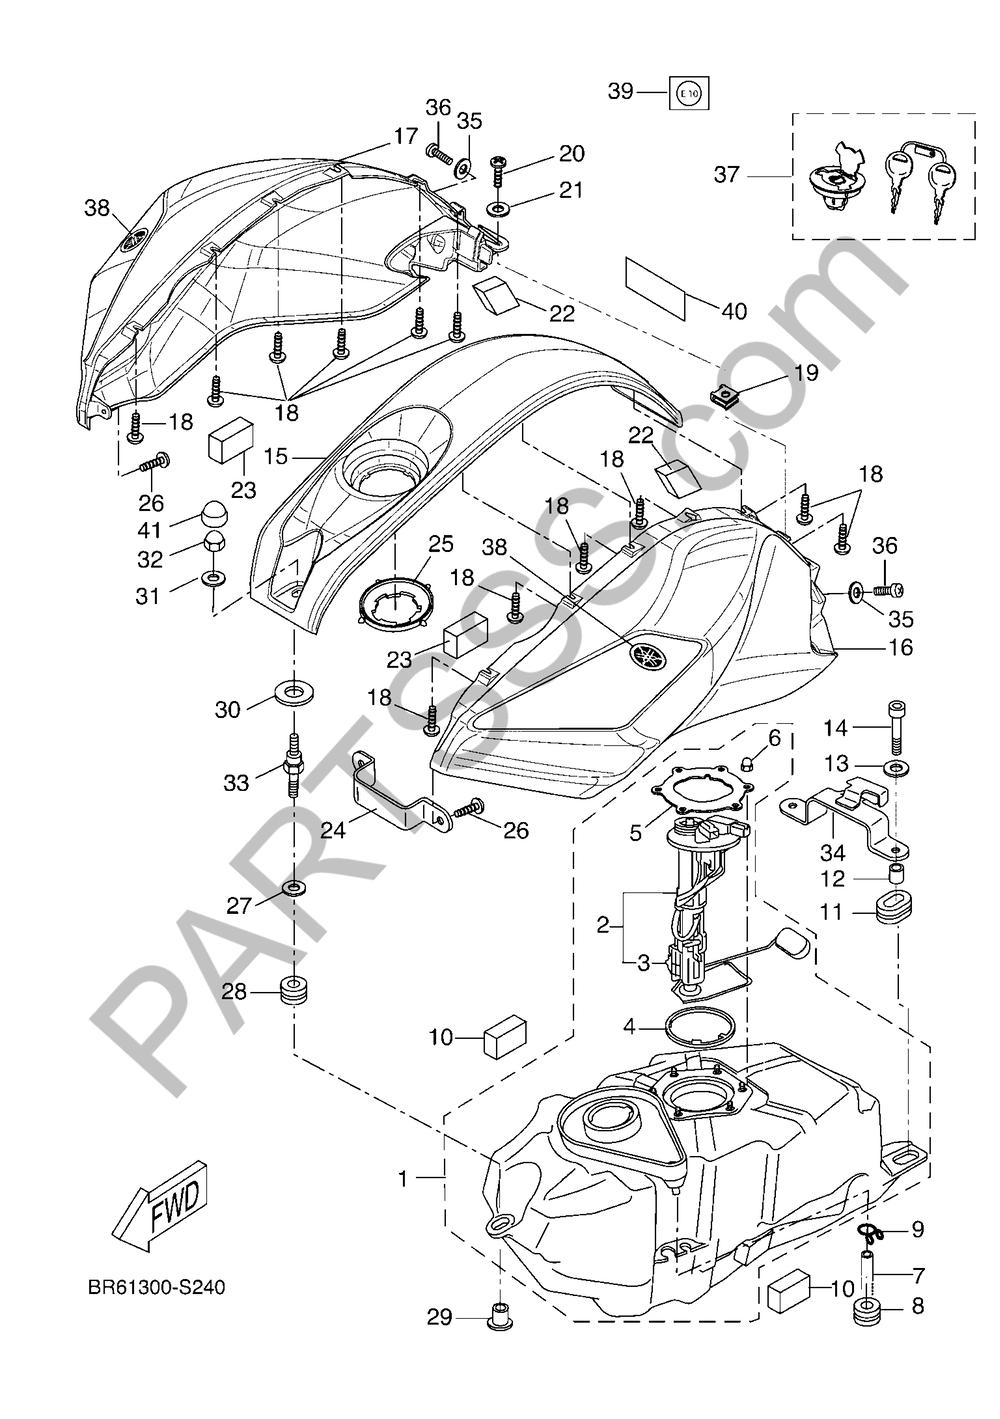 DEPOSITO DE COMBUSTIBLE Yamaha YZF-R125 ABS 2017